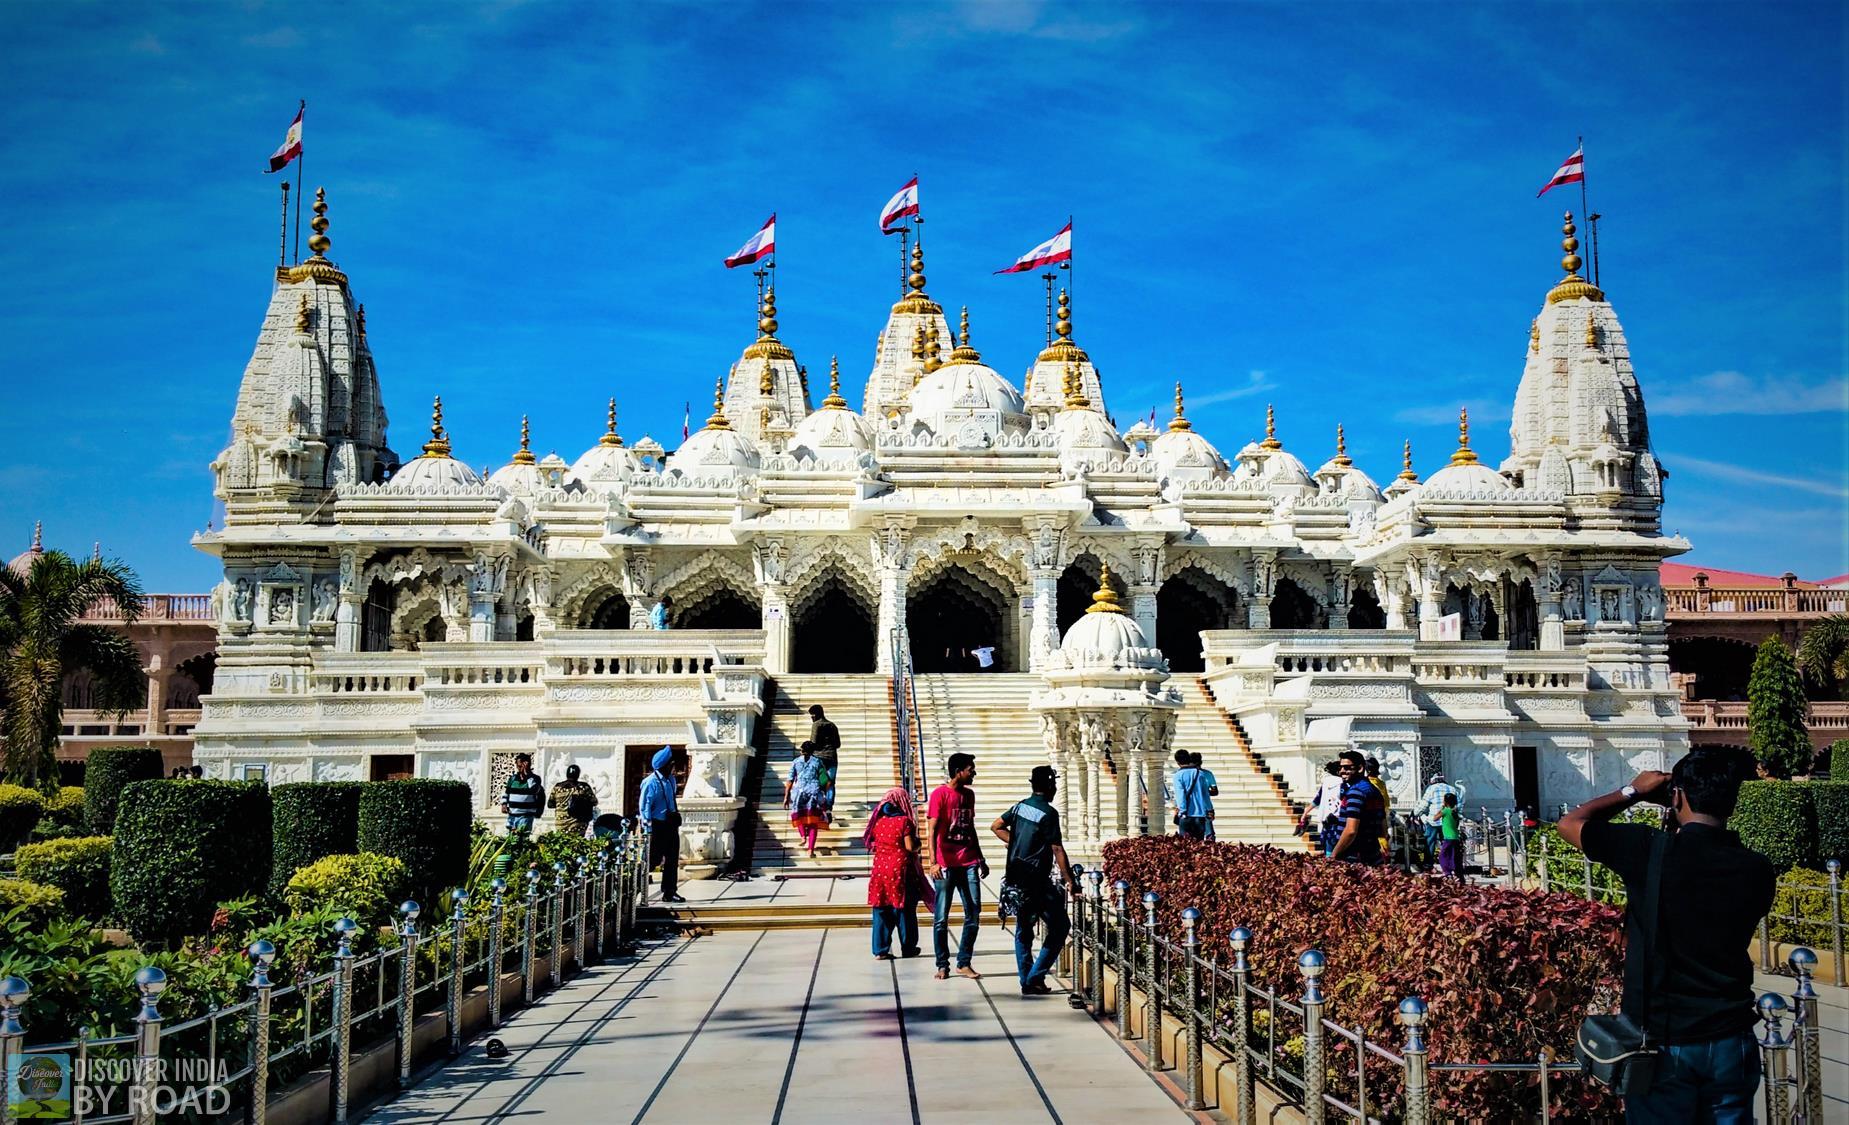 Bhuj Main Swaminarayan temple day time view